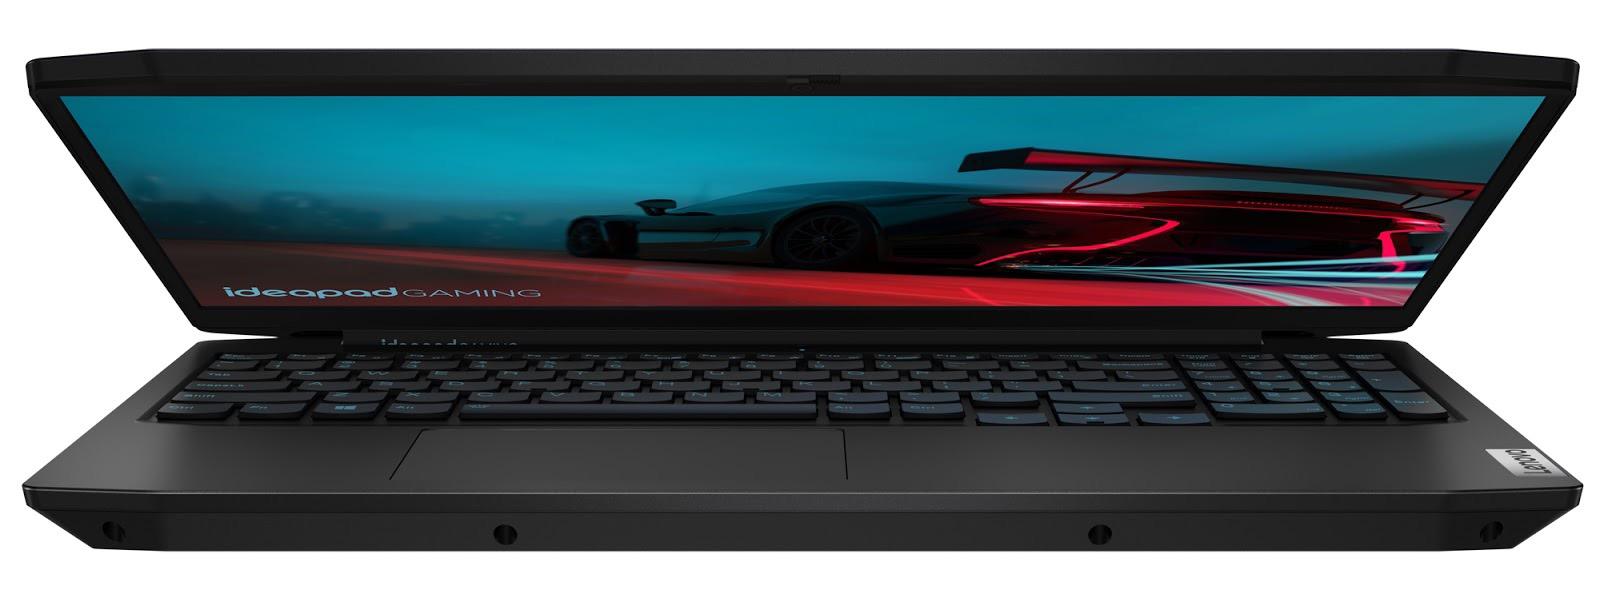 Фото 1. Ноутбук Lenovo ideapad Gaming 3 15IMH05 Onyx Black (81Y400CJRE)